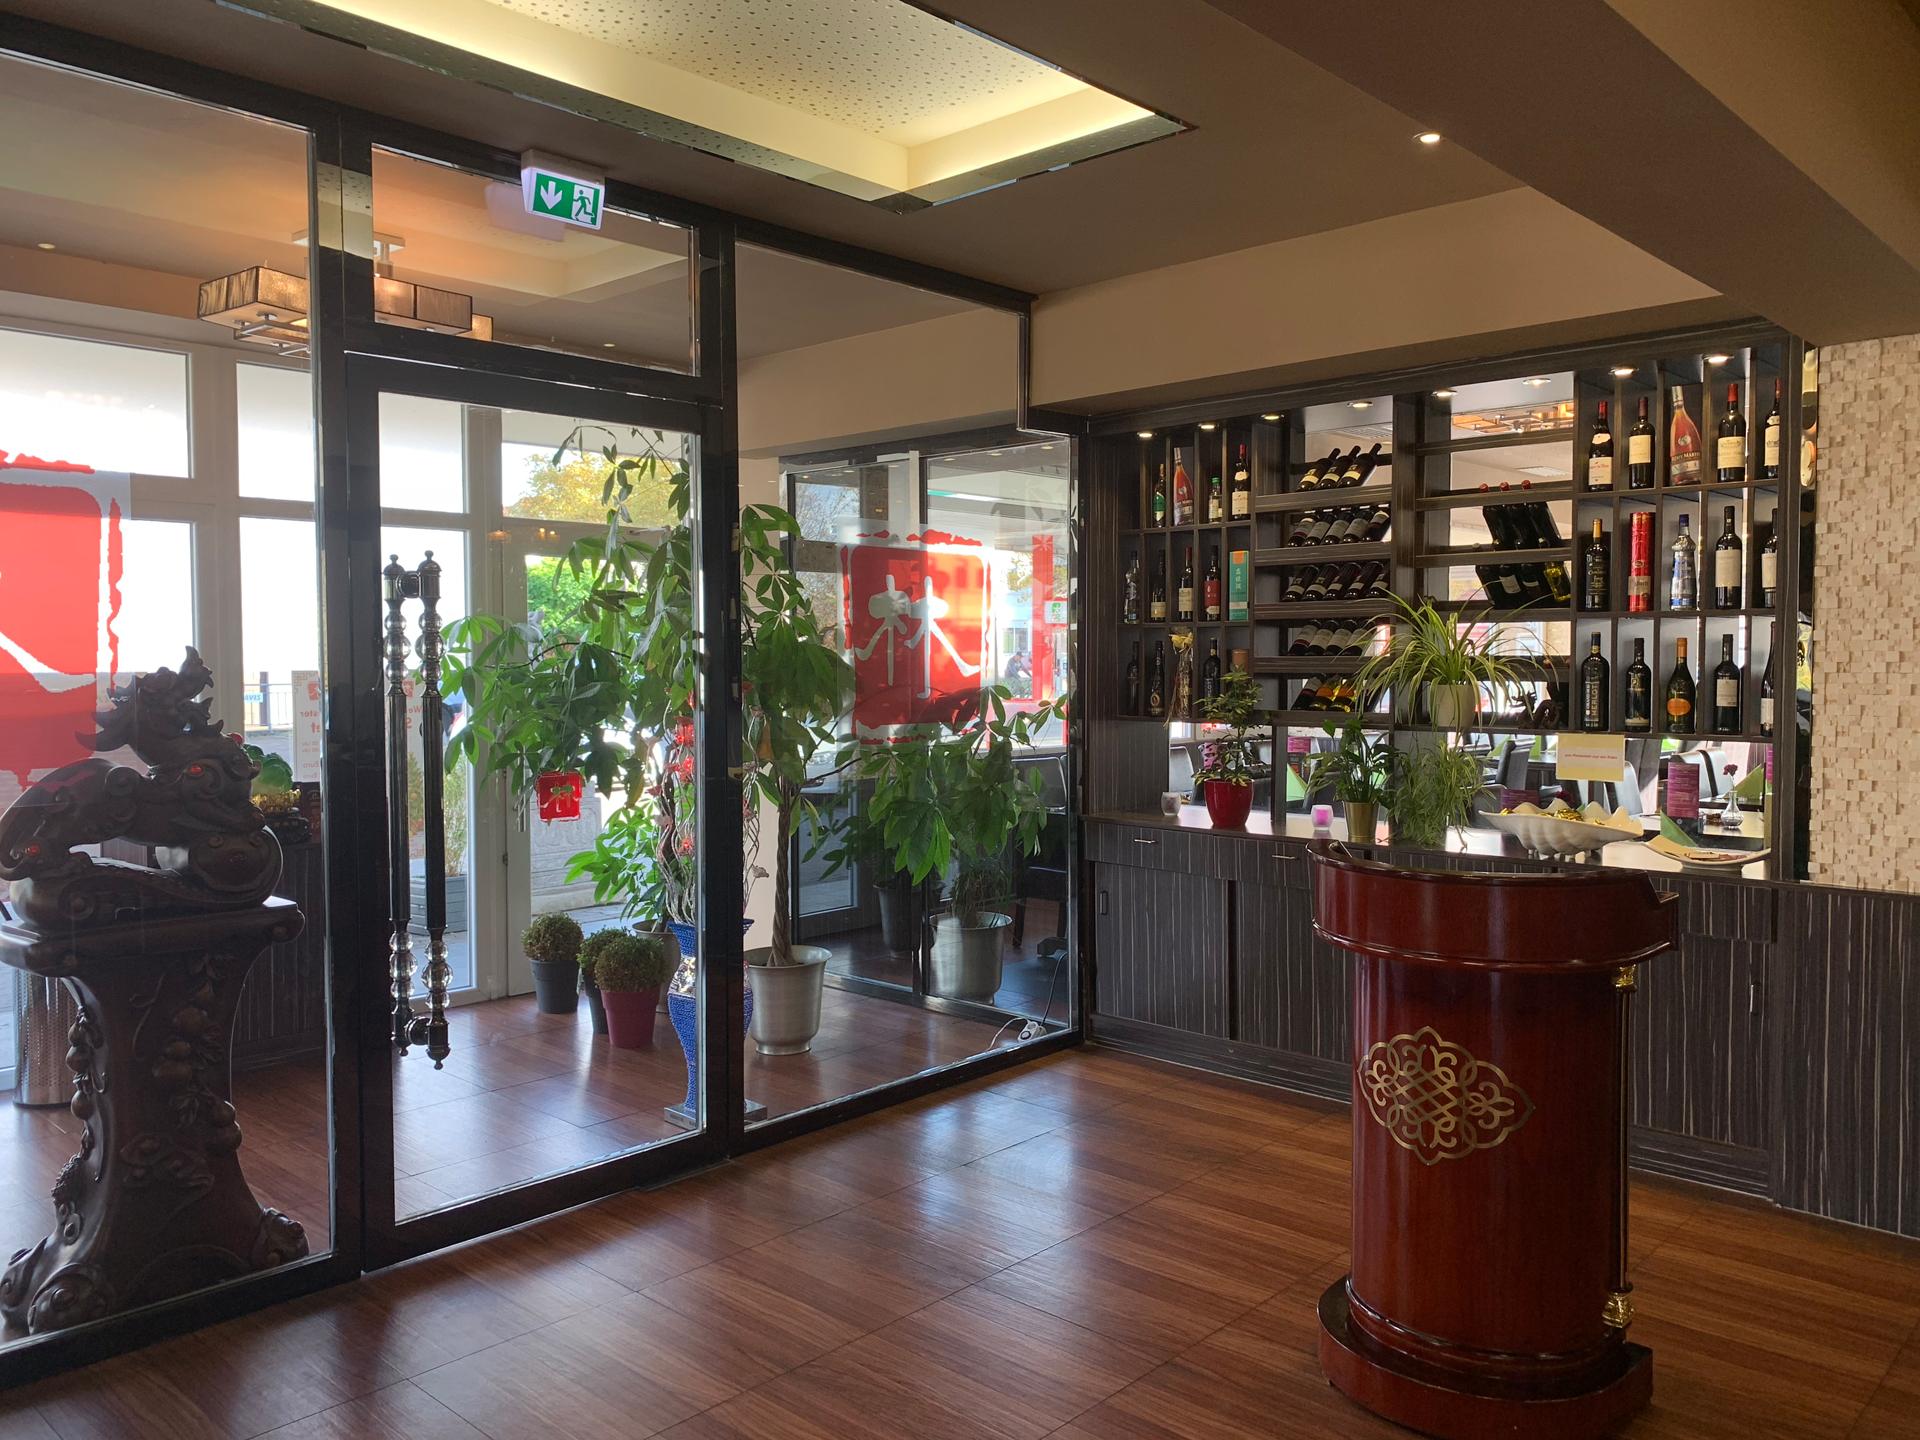 Restaurant Lin - Bad Oeynhausen